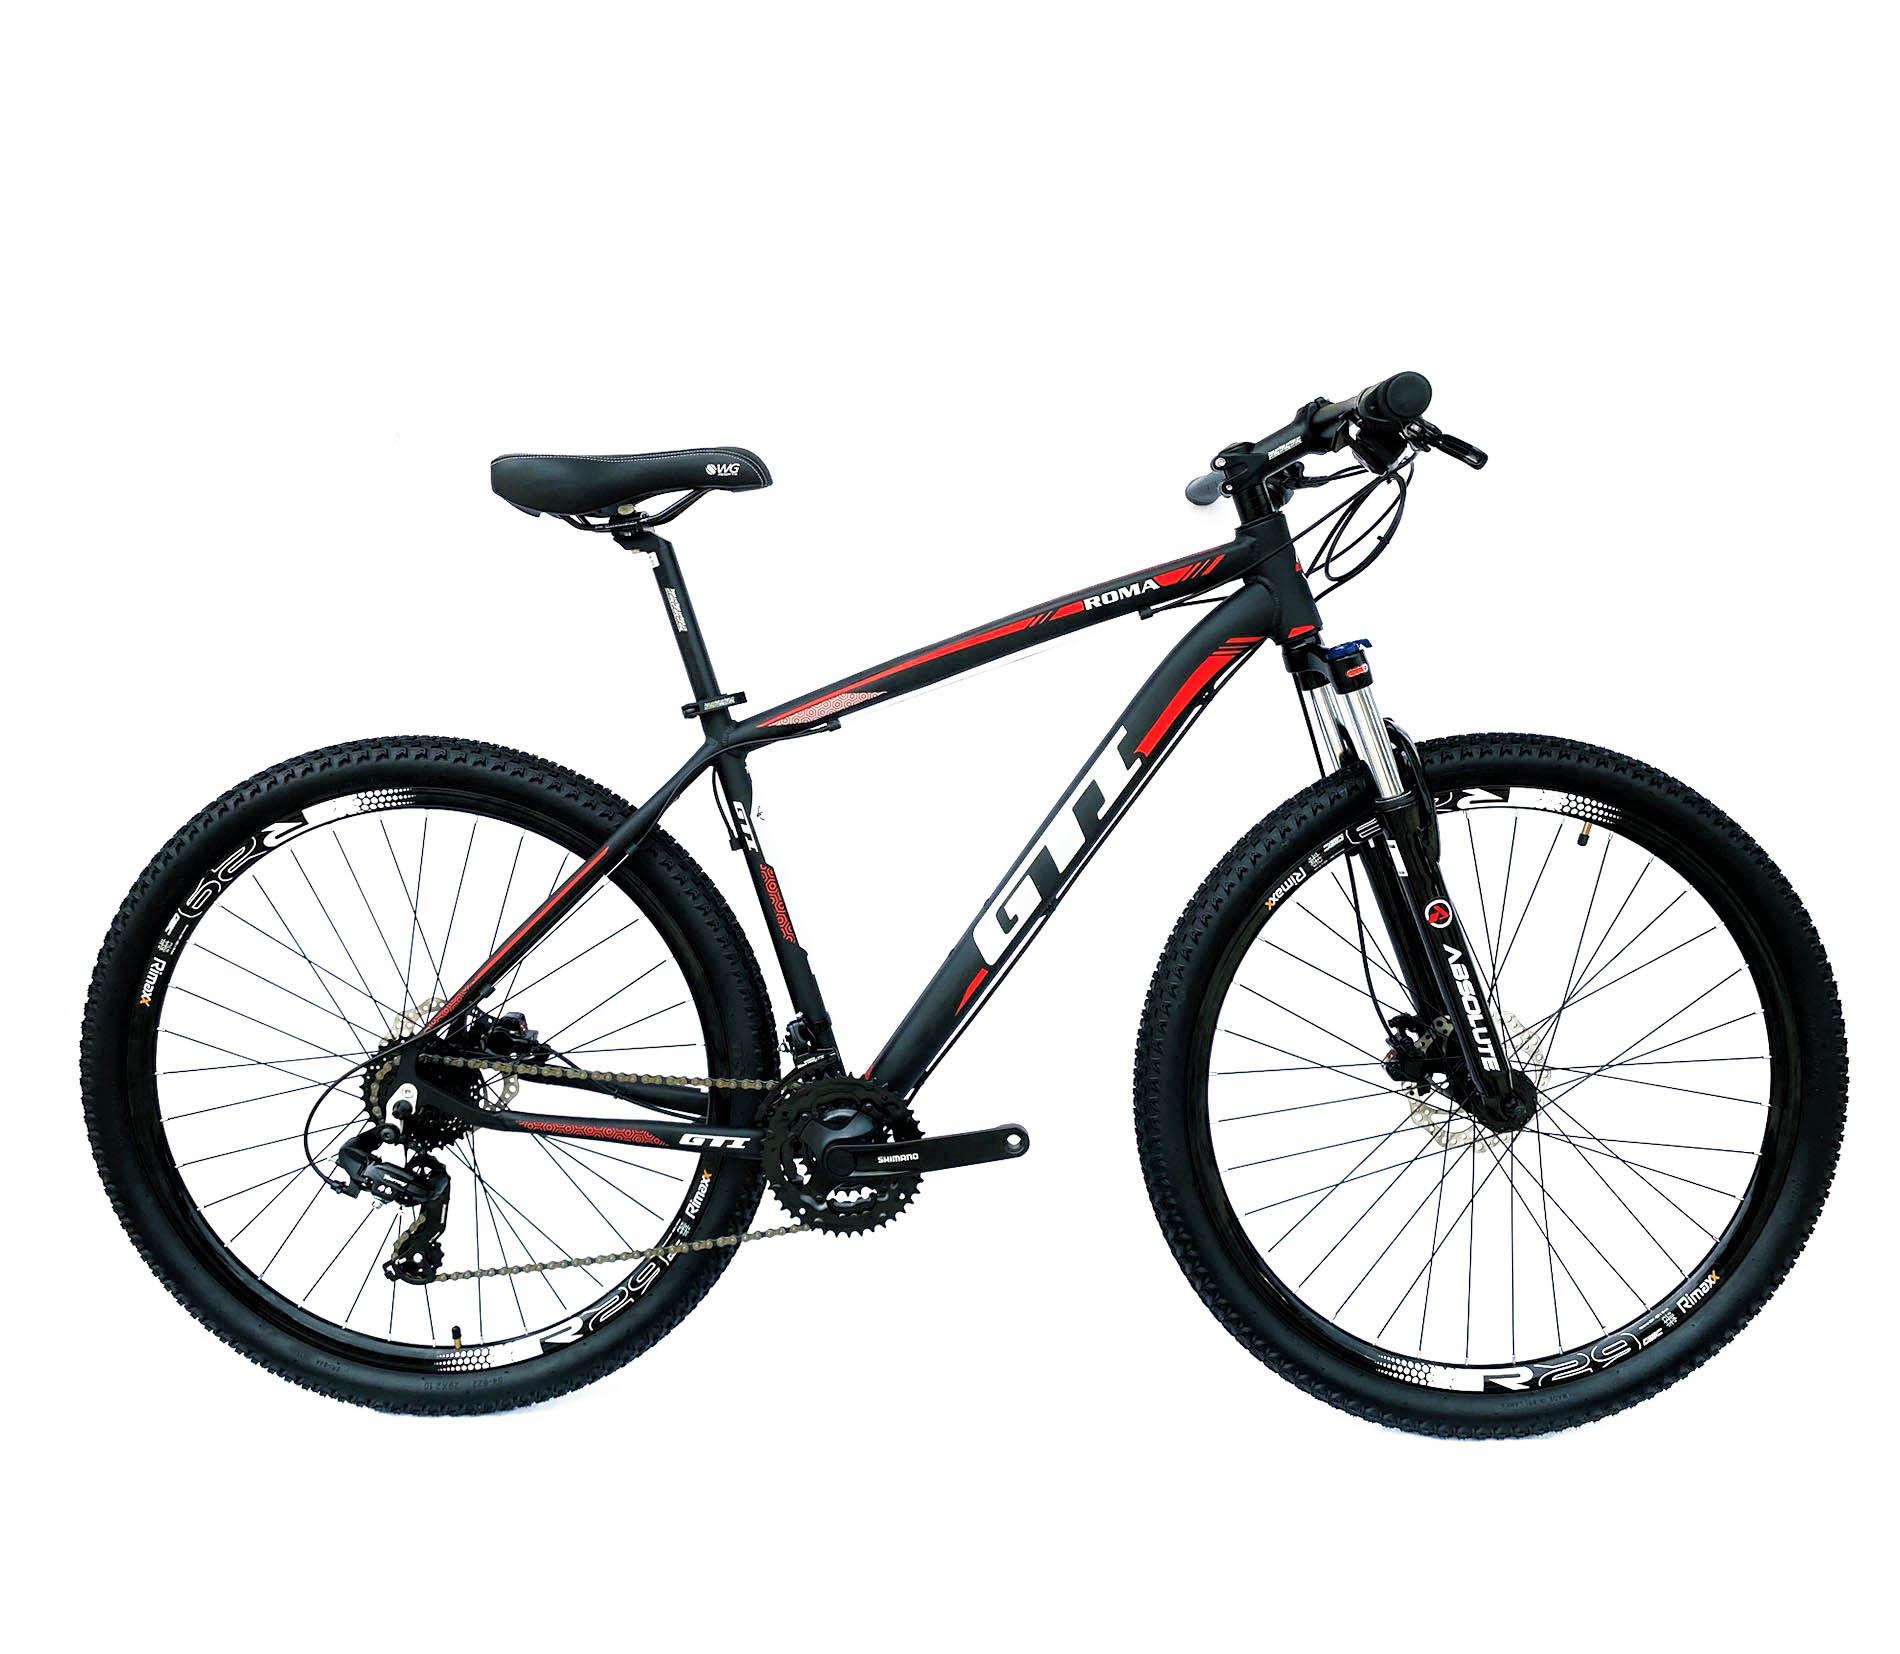 Bicicleta Aro 29 Roma GTI 24v Cambios PDV Shimano Freio Hidraulico Susp c/ Trava Ombro